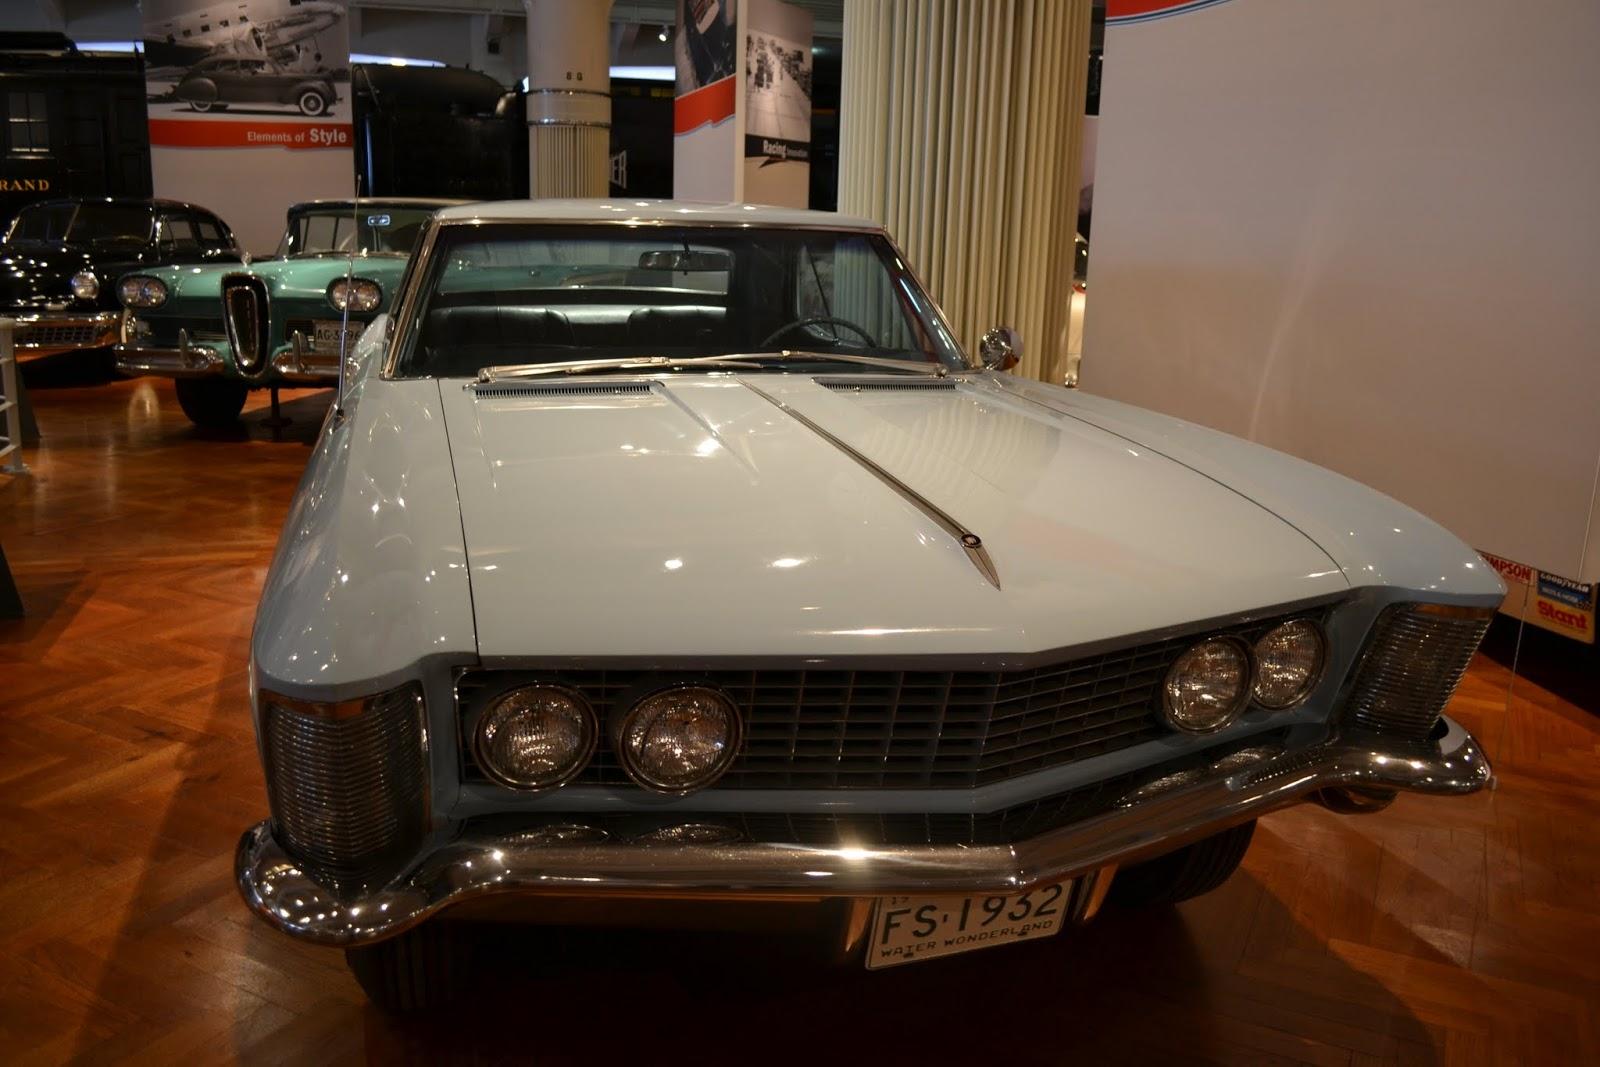 1963 Buick Riviera. Музей Генри Форда. Дирборн, Мичиган (Henry Ford Museum, Dearborn, MI)